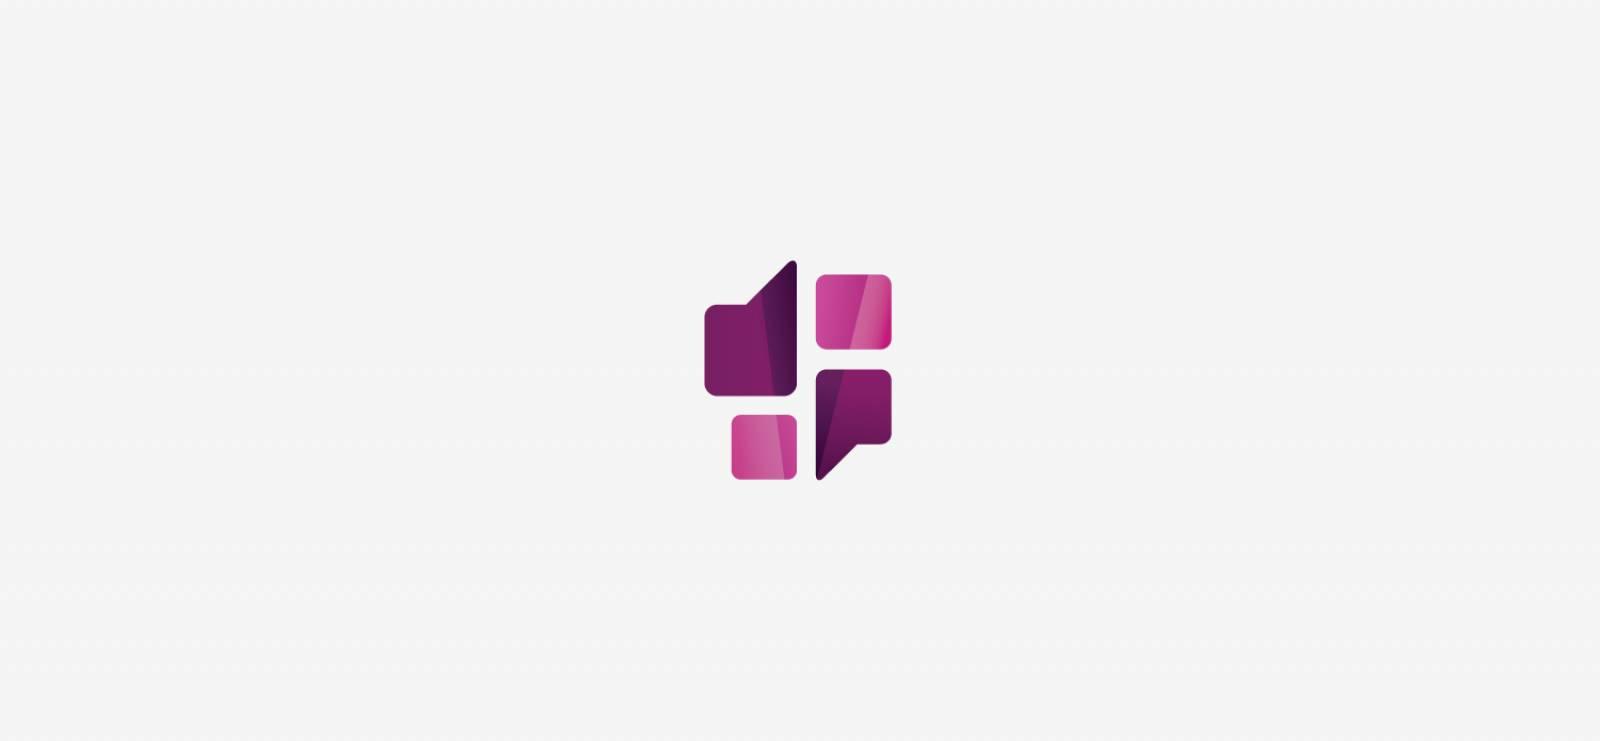 Fenestra-logo-3-design-agency-graphic-design-canterbury.jpg